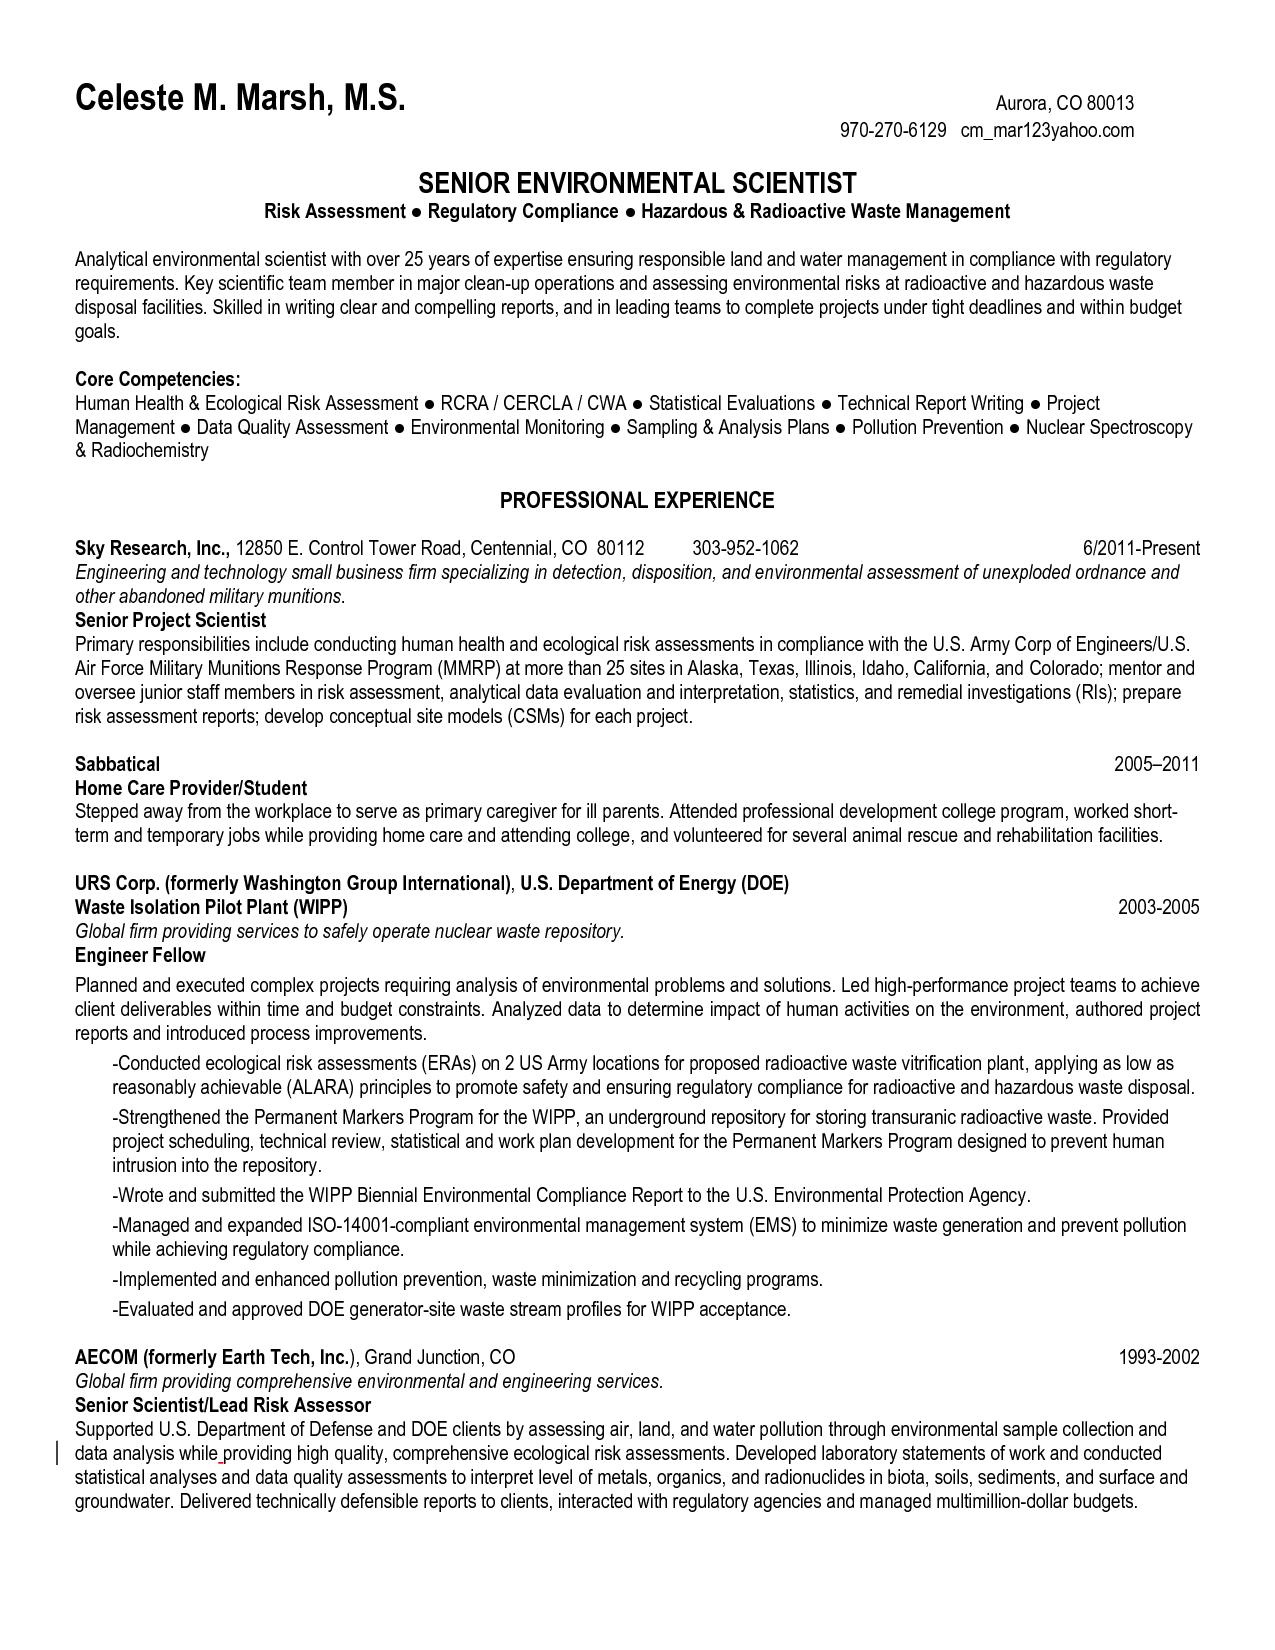 Environmental Science Resume Sample Http Www Resumecareer Info Environmental Science Resume Sample 4 Data Science Resume Examples Data Scientist